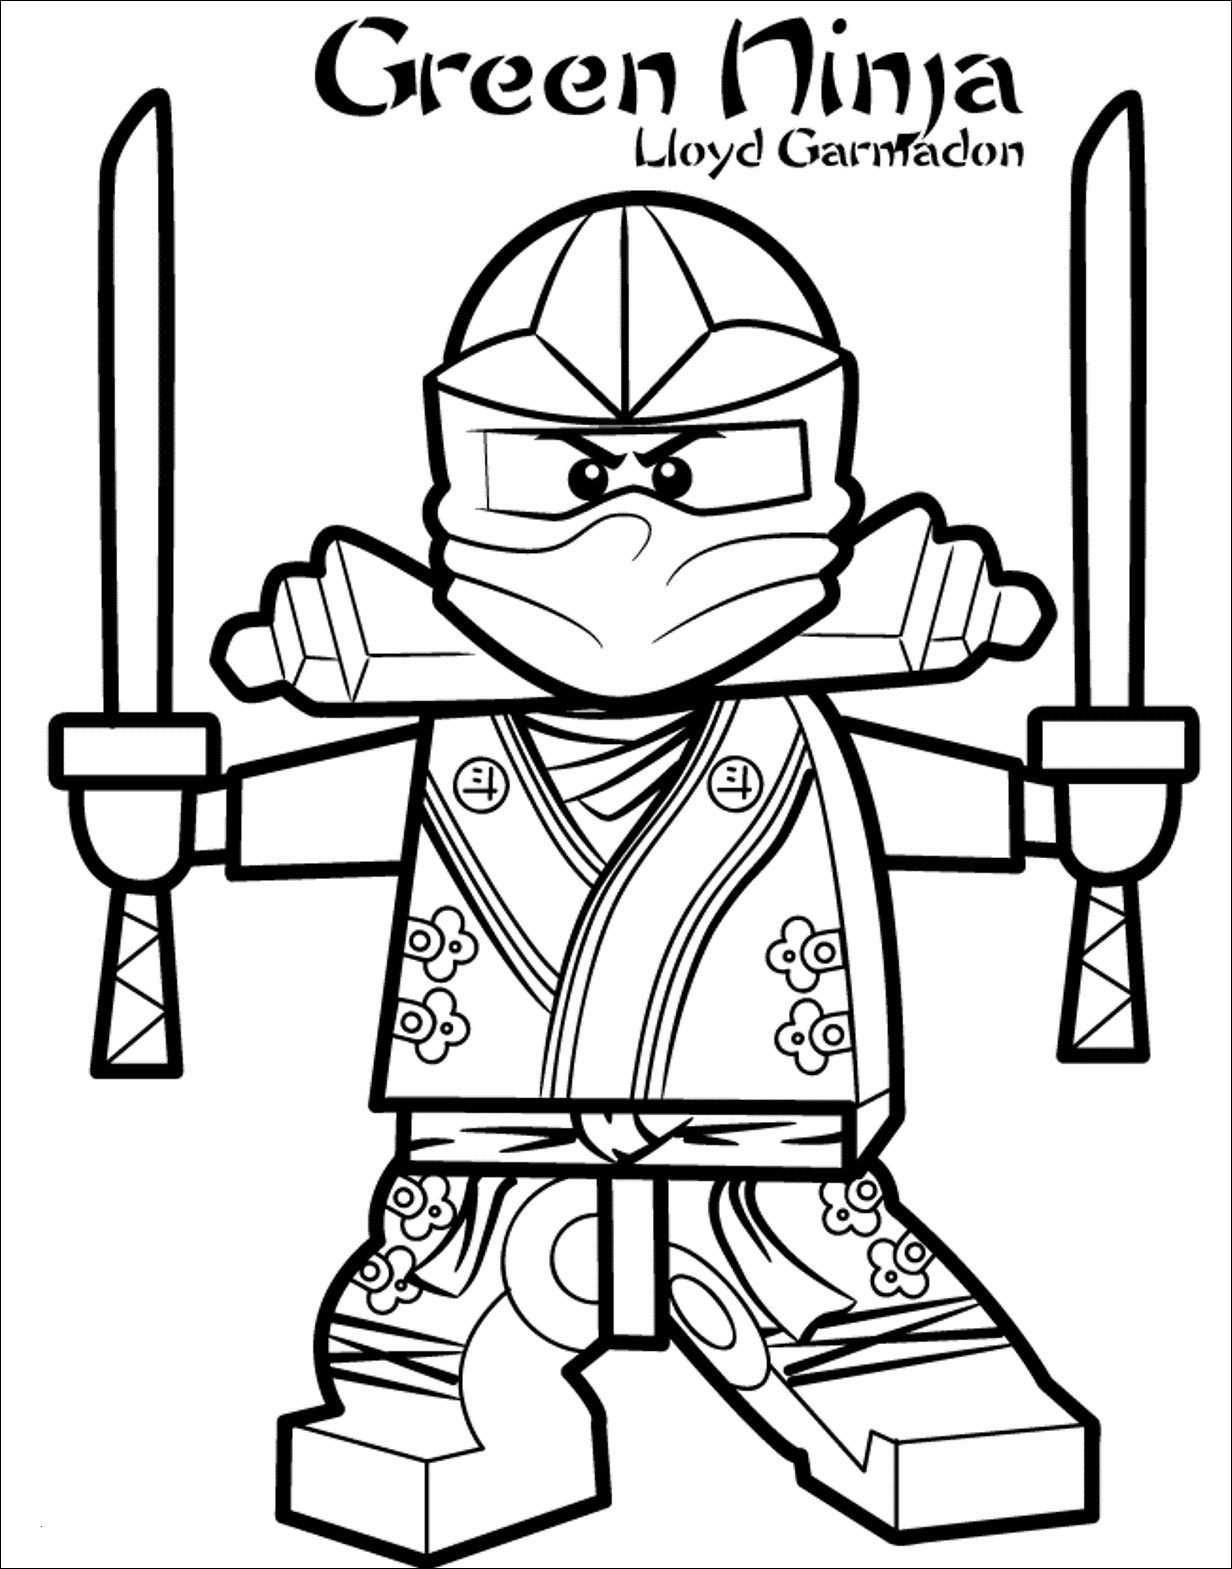 Ausmalbilder Ninjago Zane Genial Ausmalbilder Ninjago Lloyd Gemälde 37 Malvorlagen Ninjago Lloyd Bilder